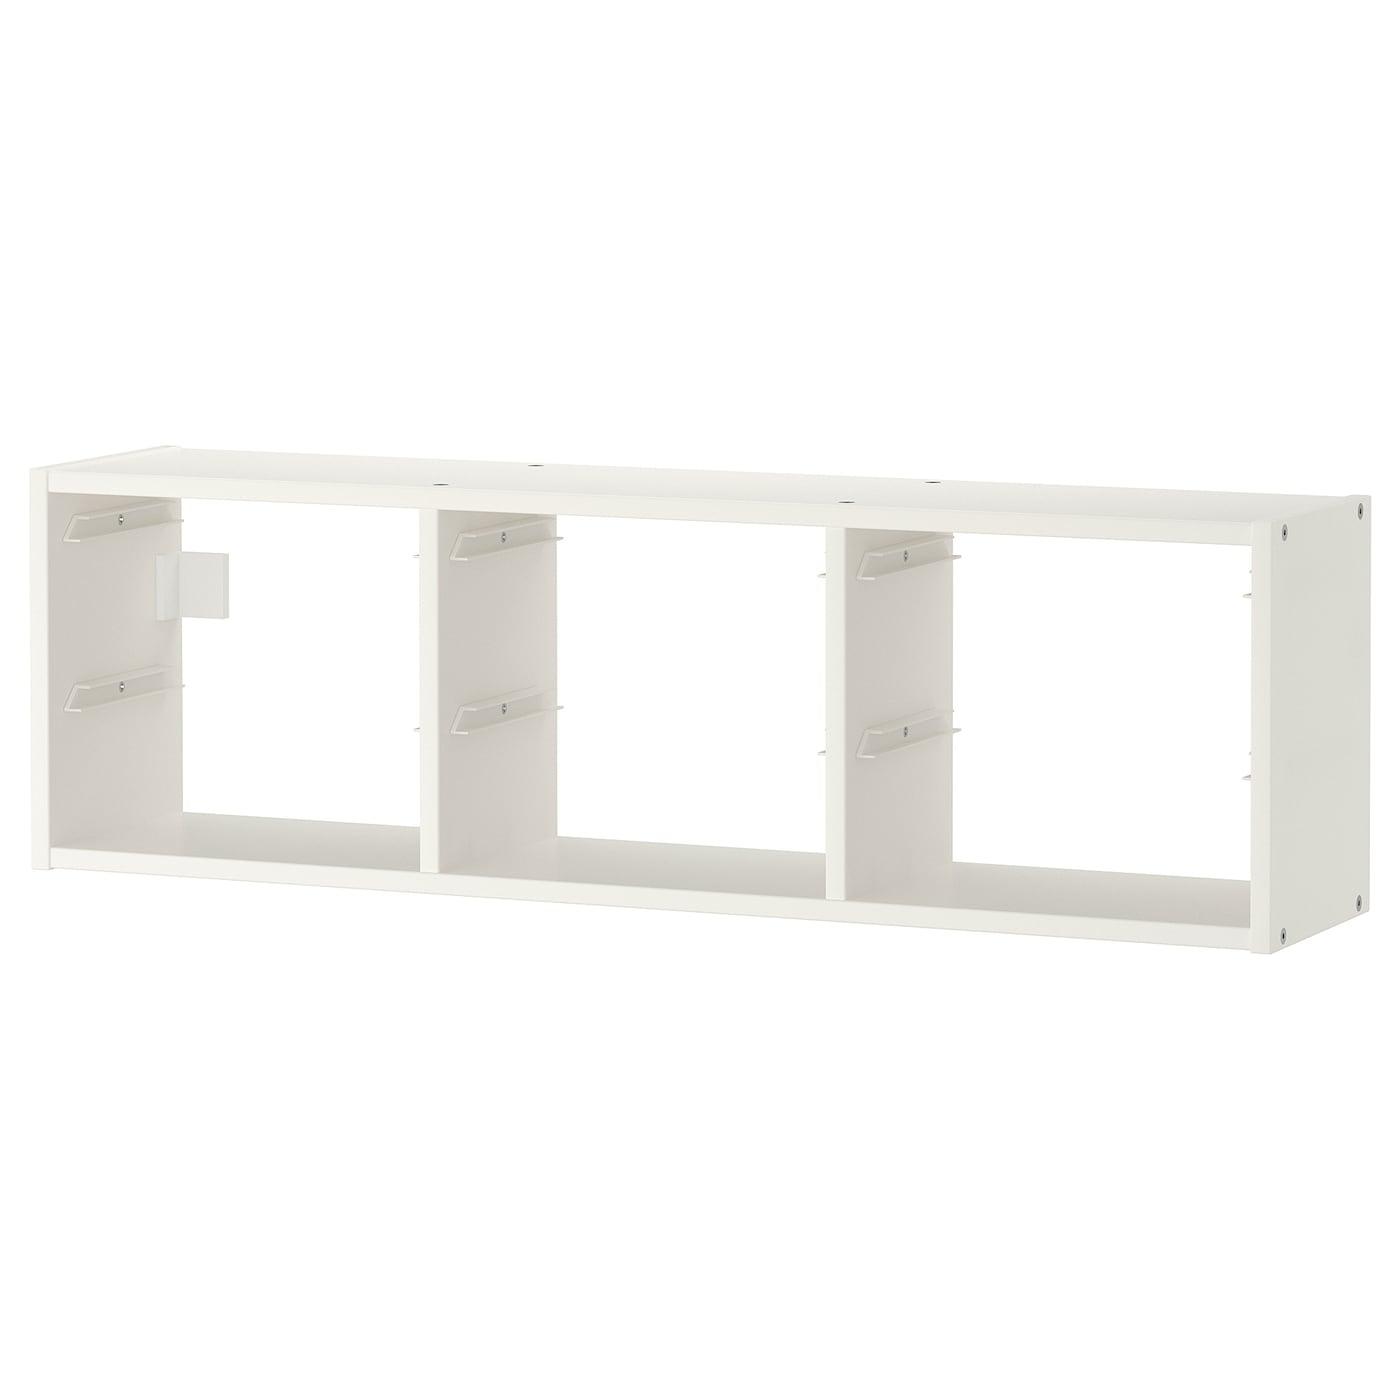 Trofast Wall Storage White Ikea Switzerland